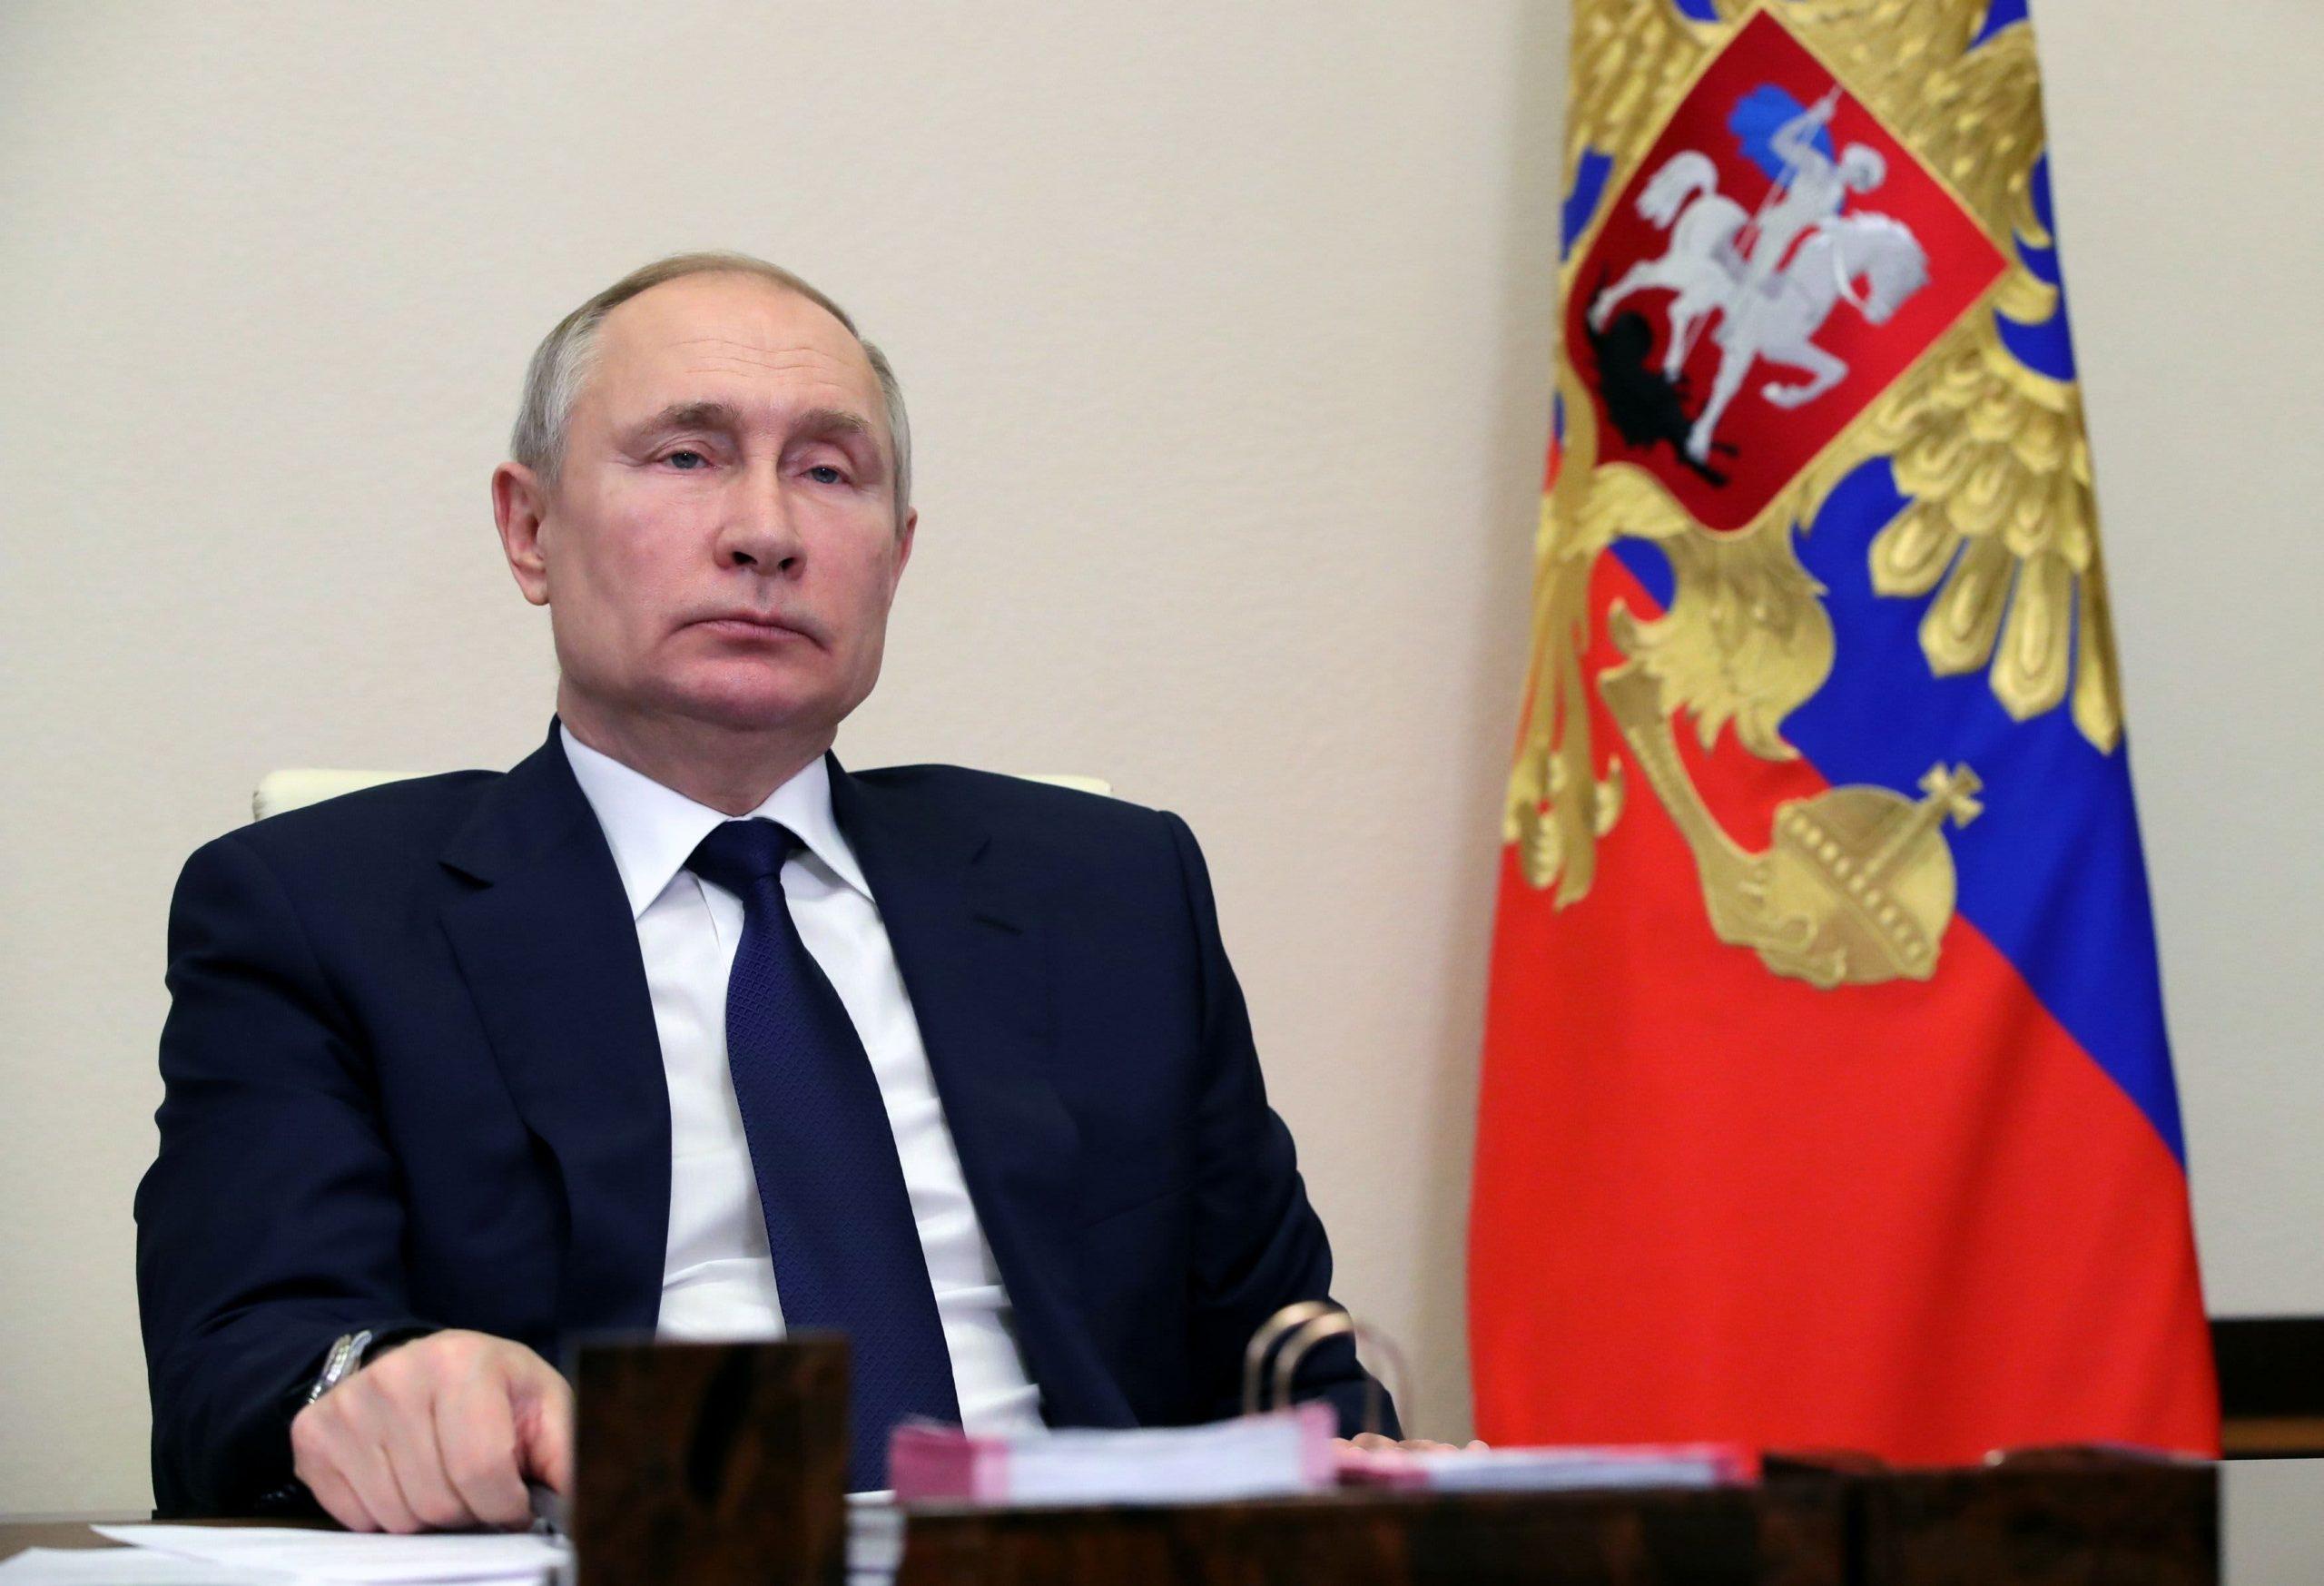 Biden proposes summit with Putin as Russia amasses on Ukraine border